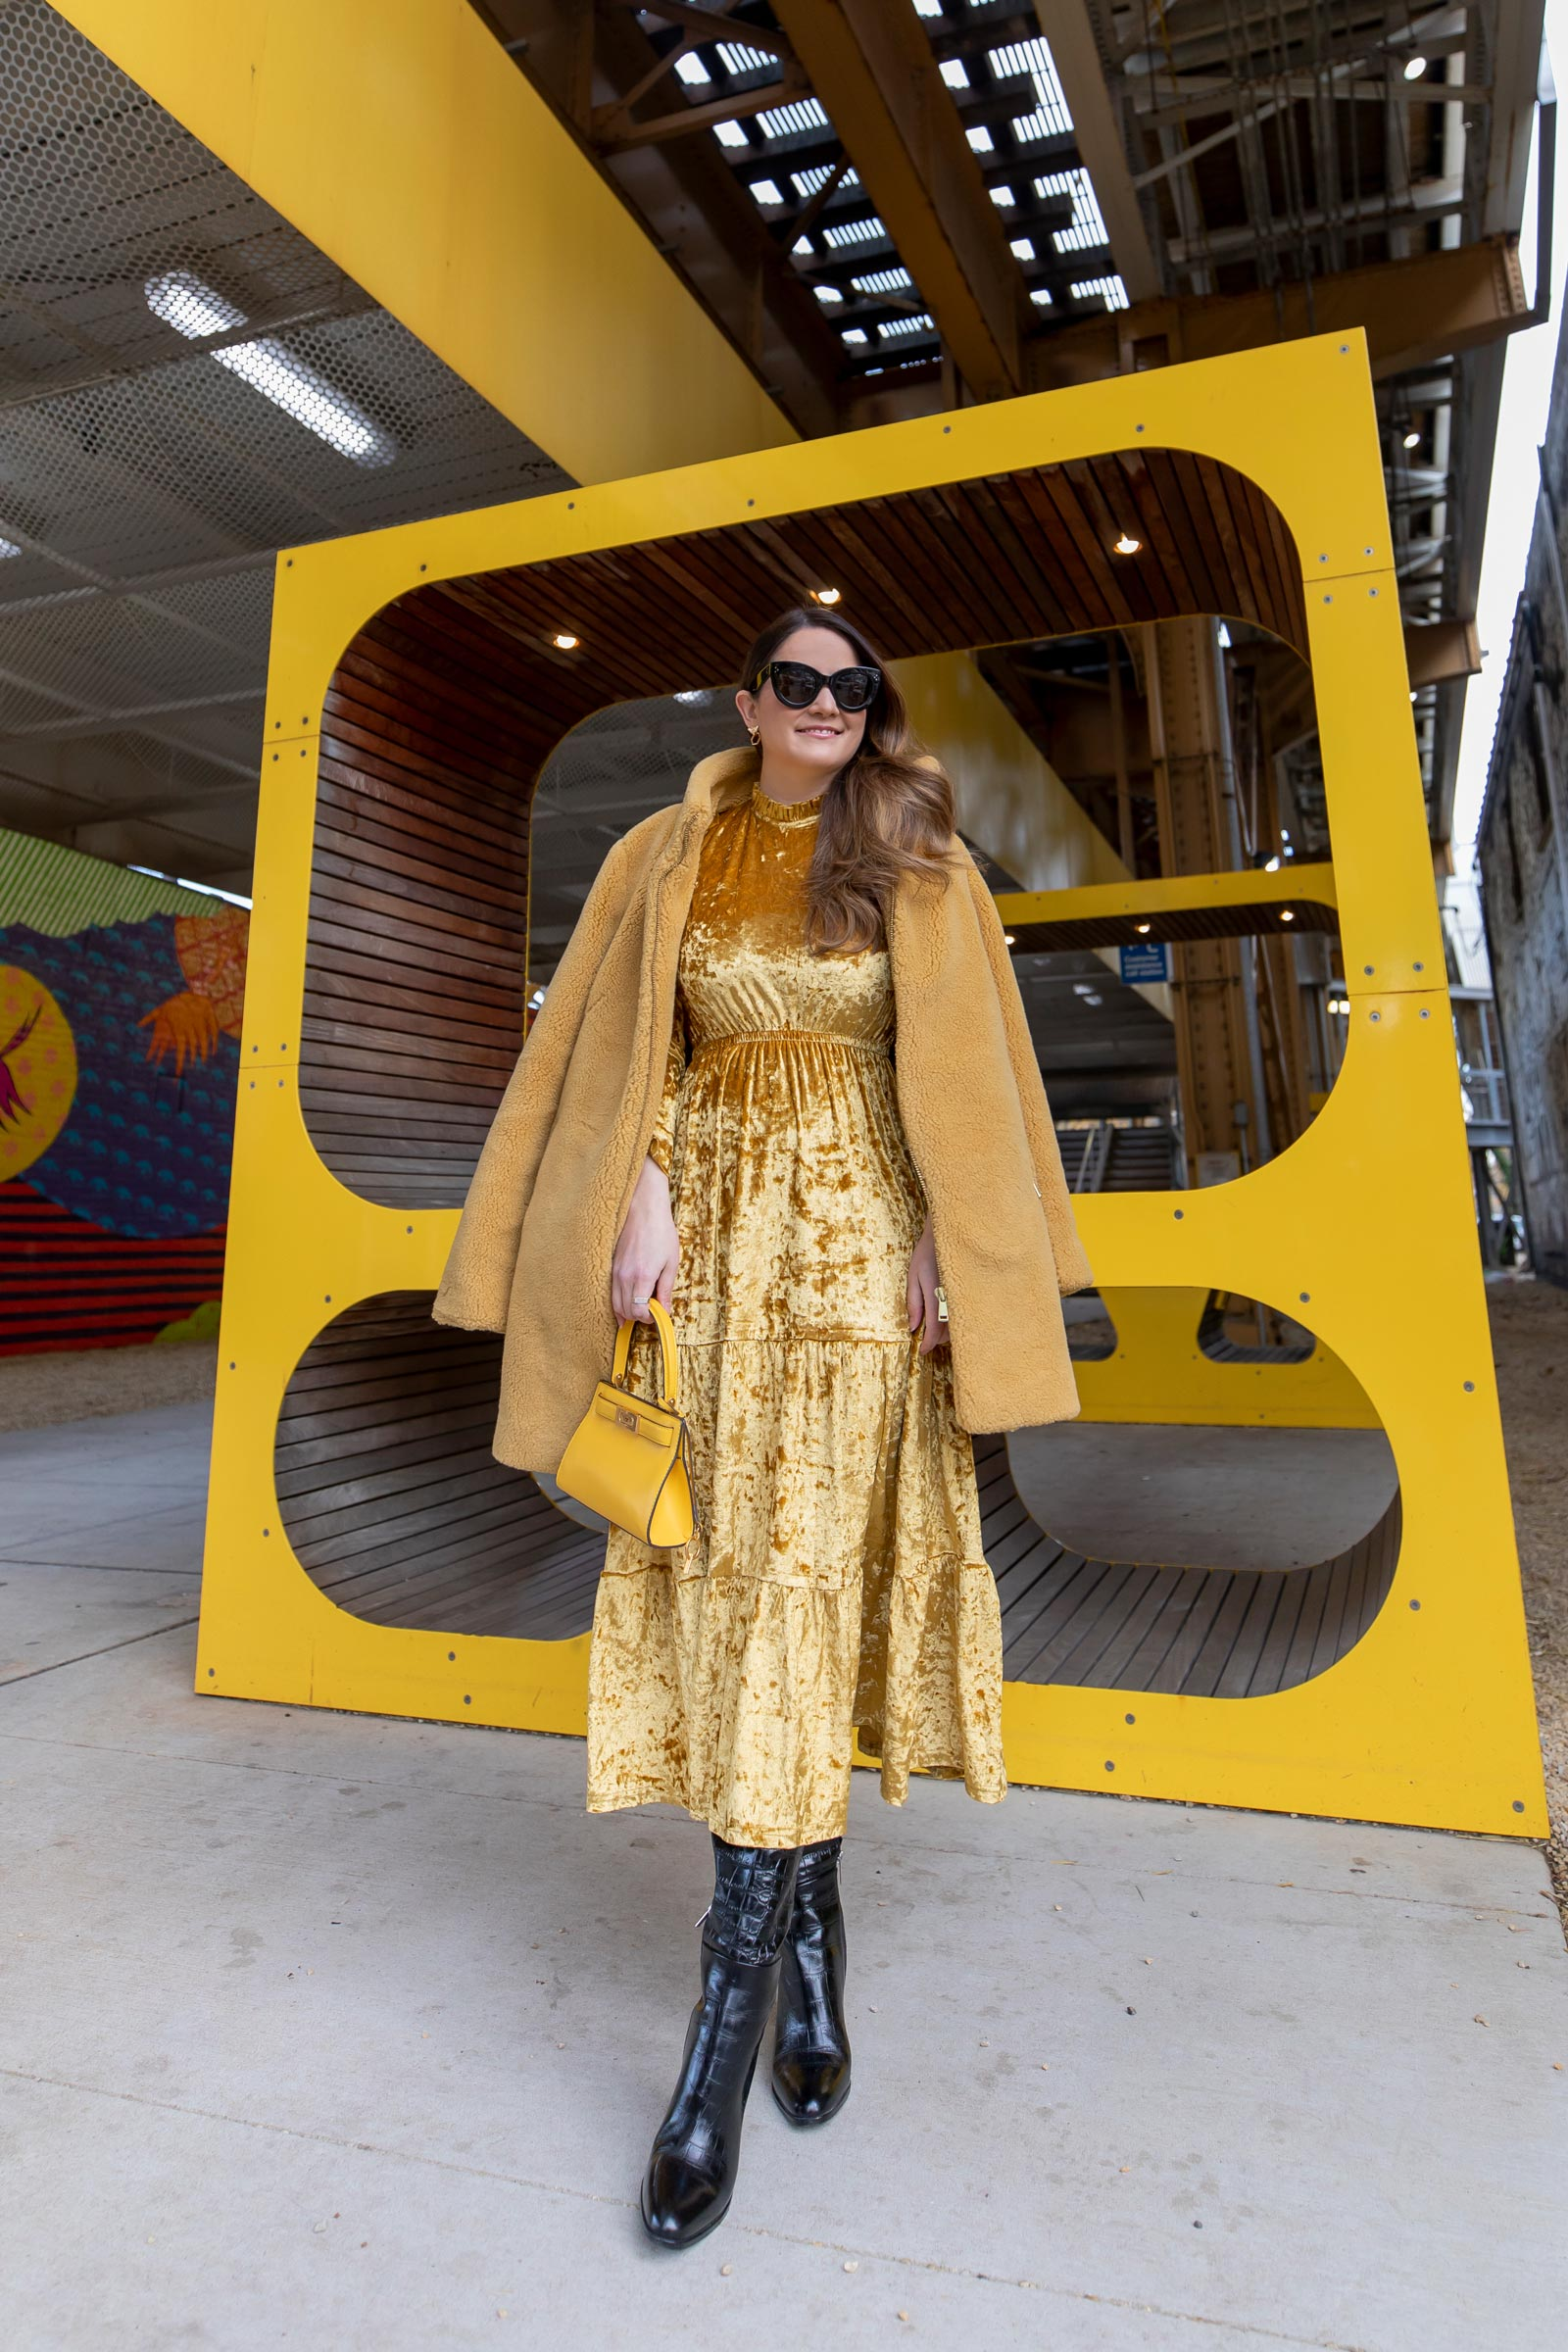 Tuckernuck Yellow Dress